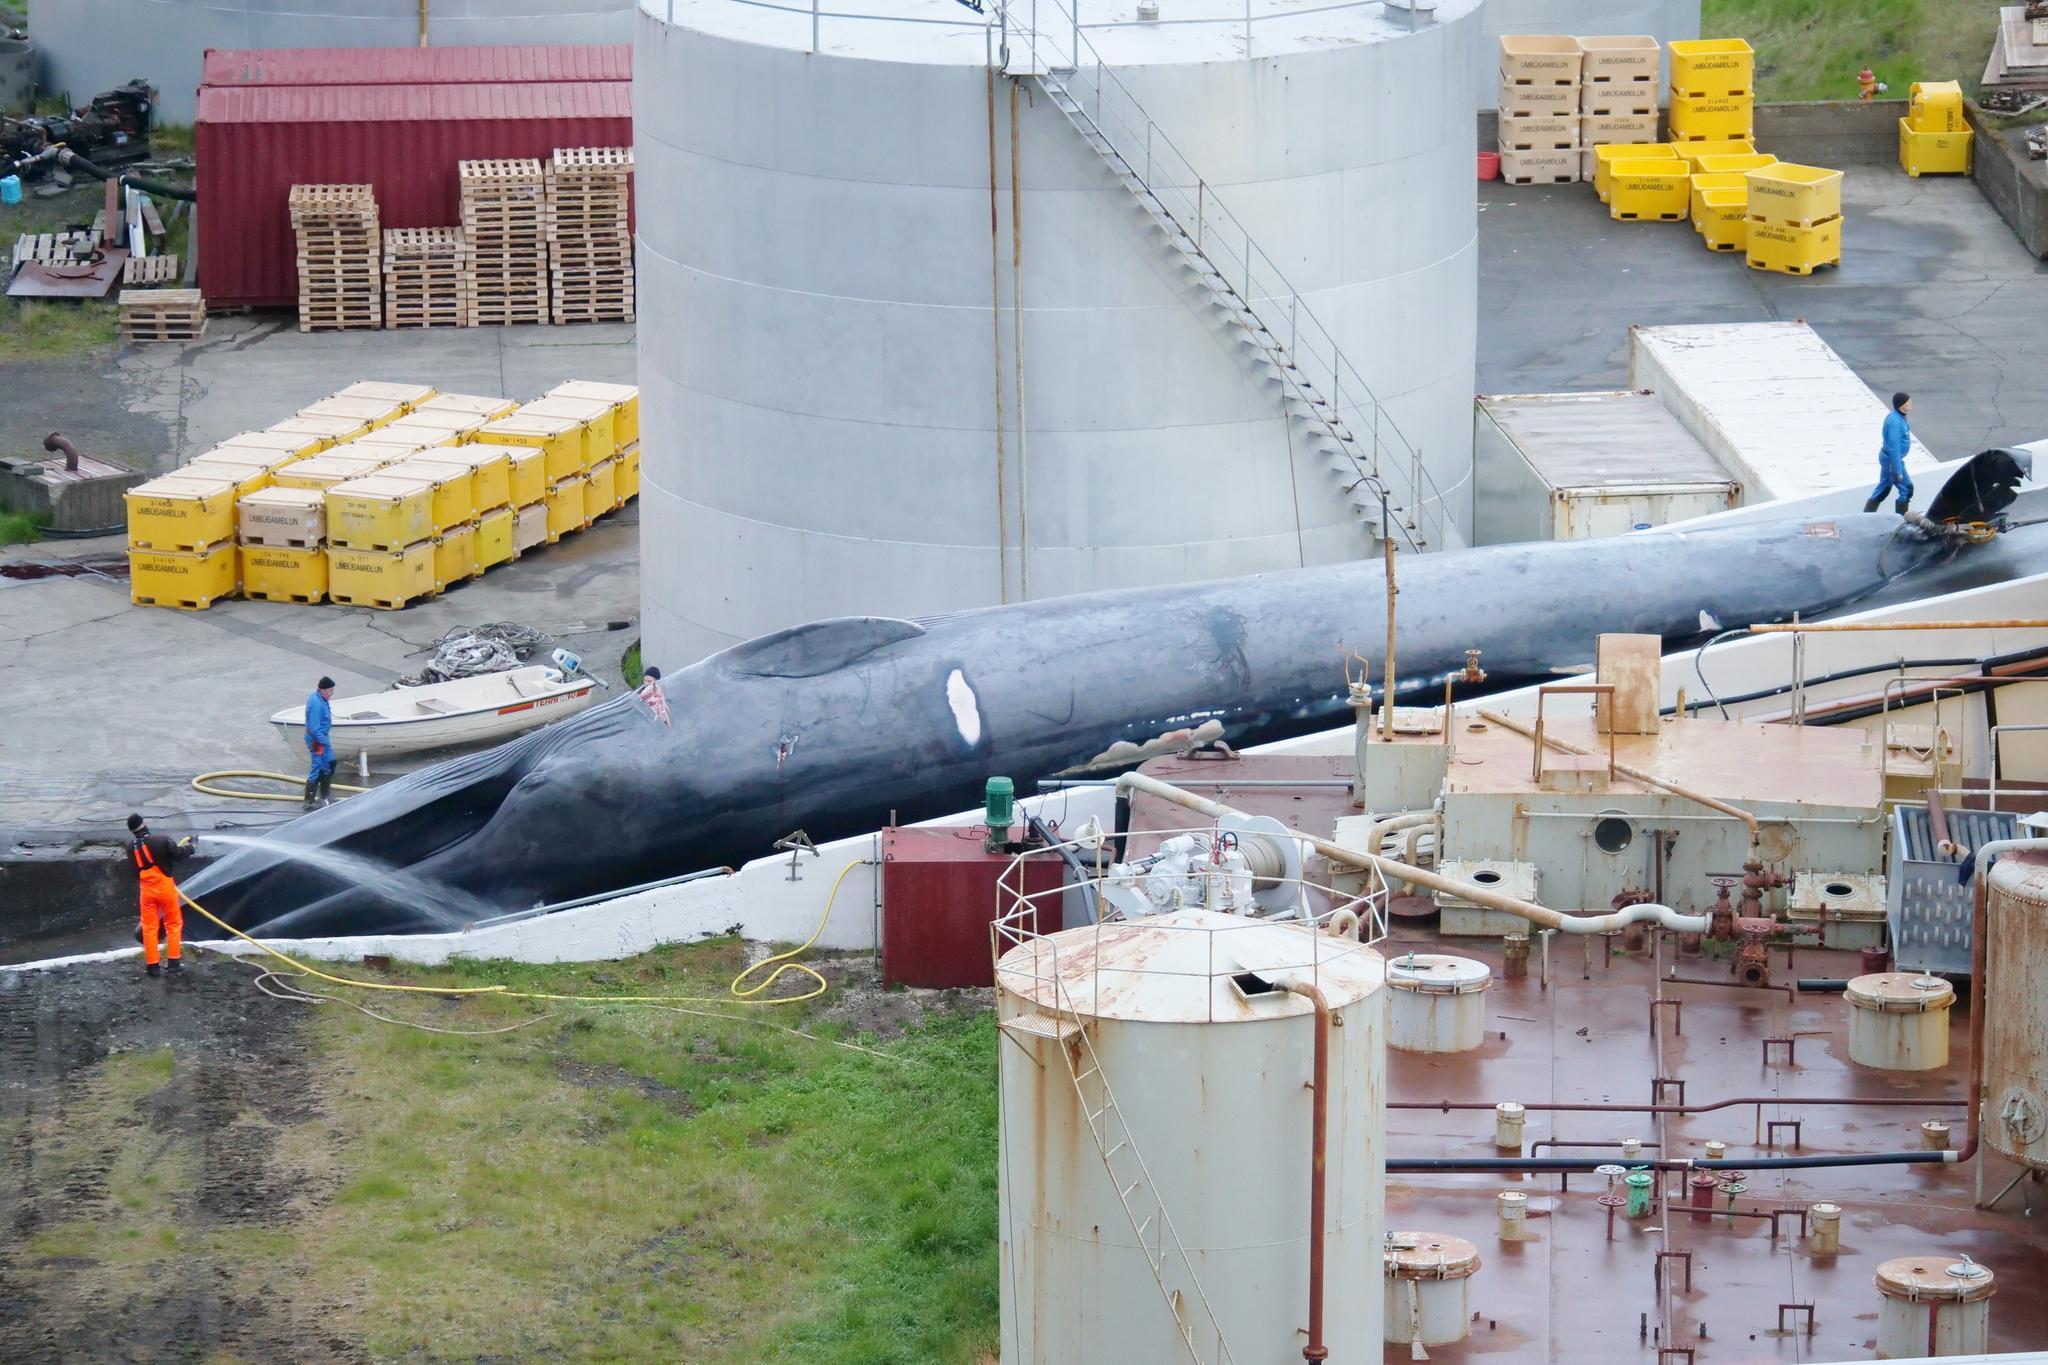 Island: Wurde ein streng geschützter Blauwal geschlachtet? | STERN.de